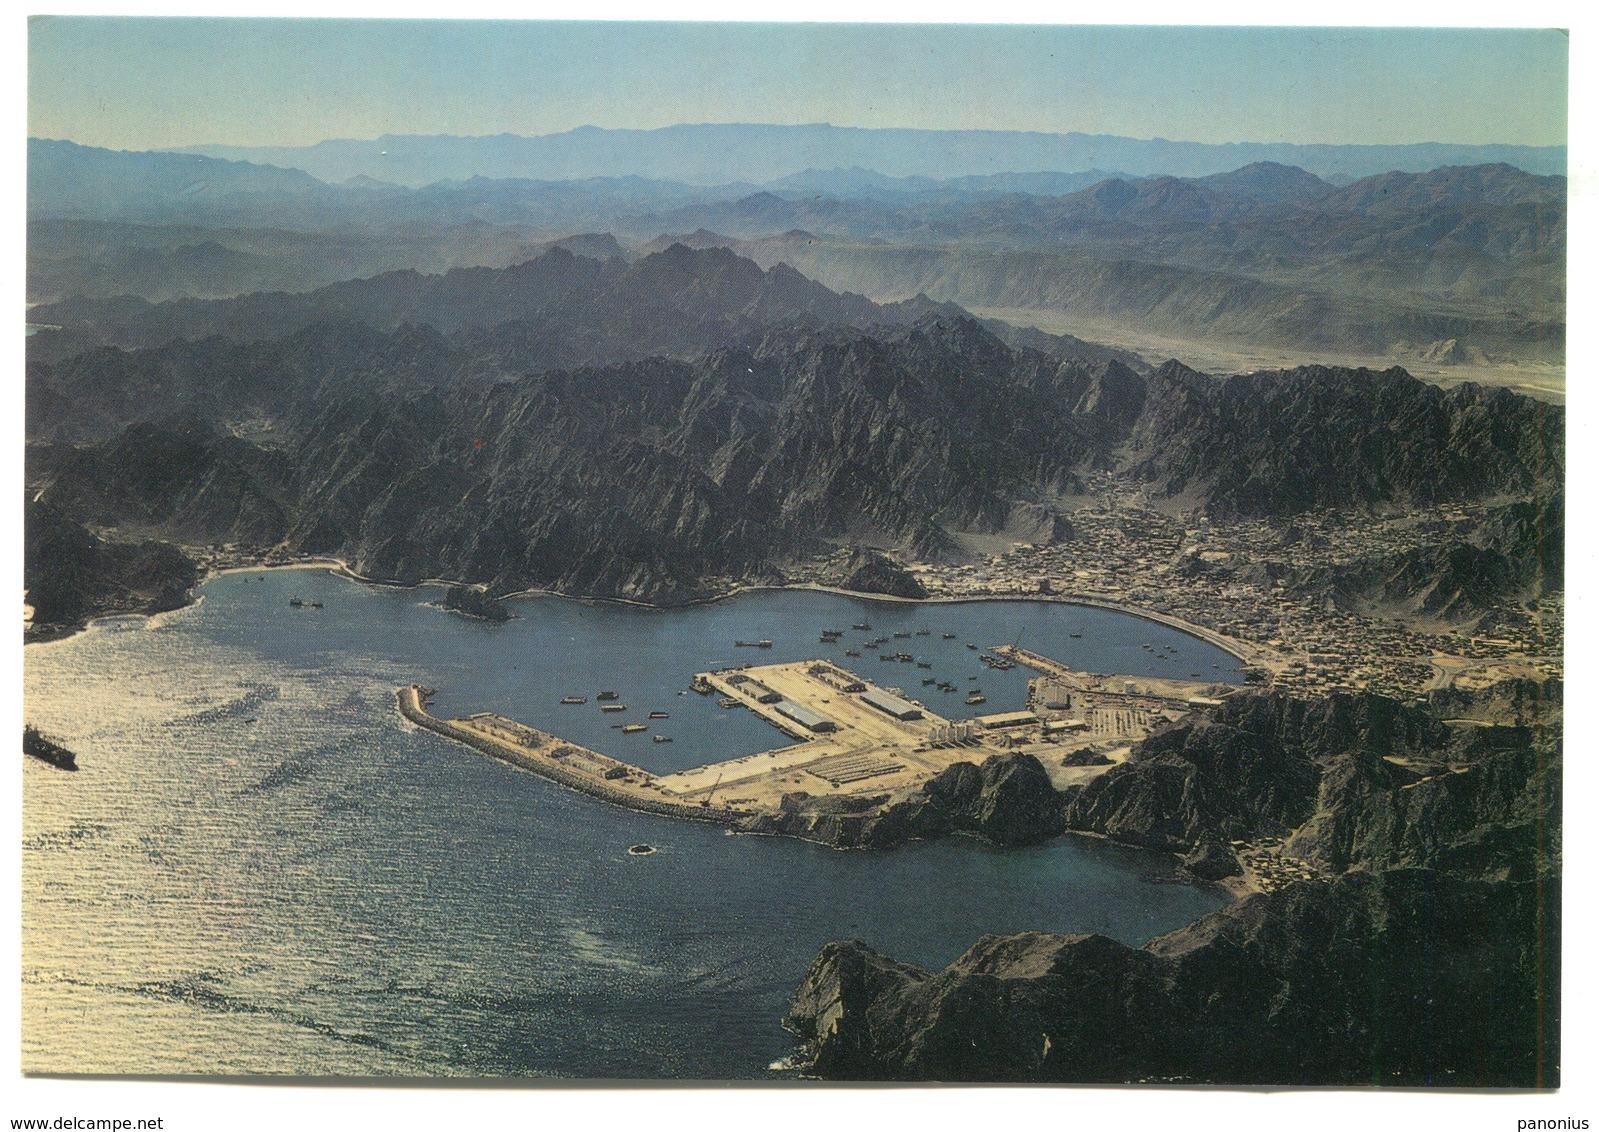 SULTANATE OF OMAN - PORT QABOOS, MUTRAH - Oman